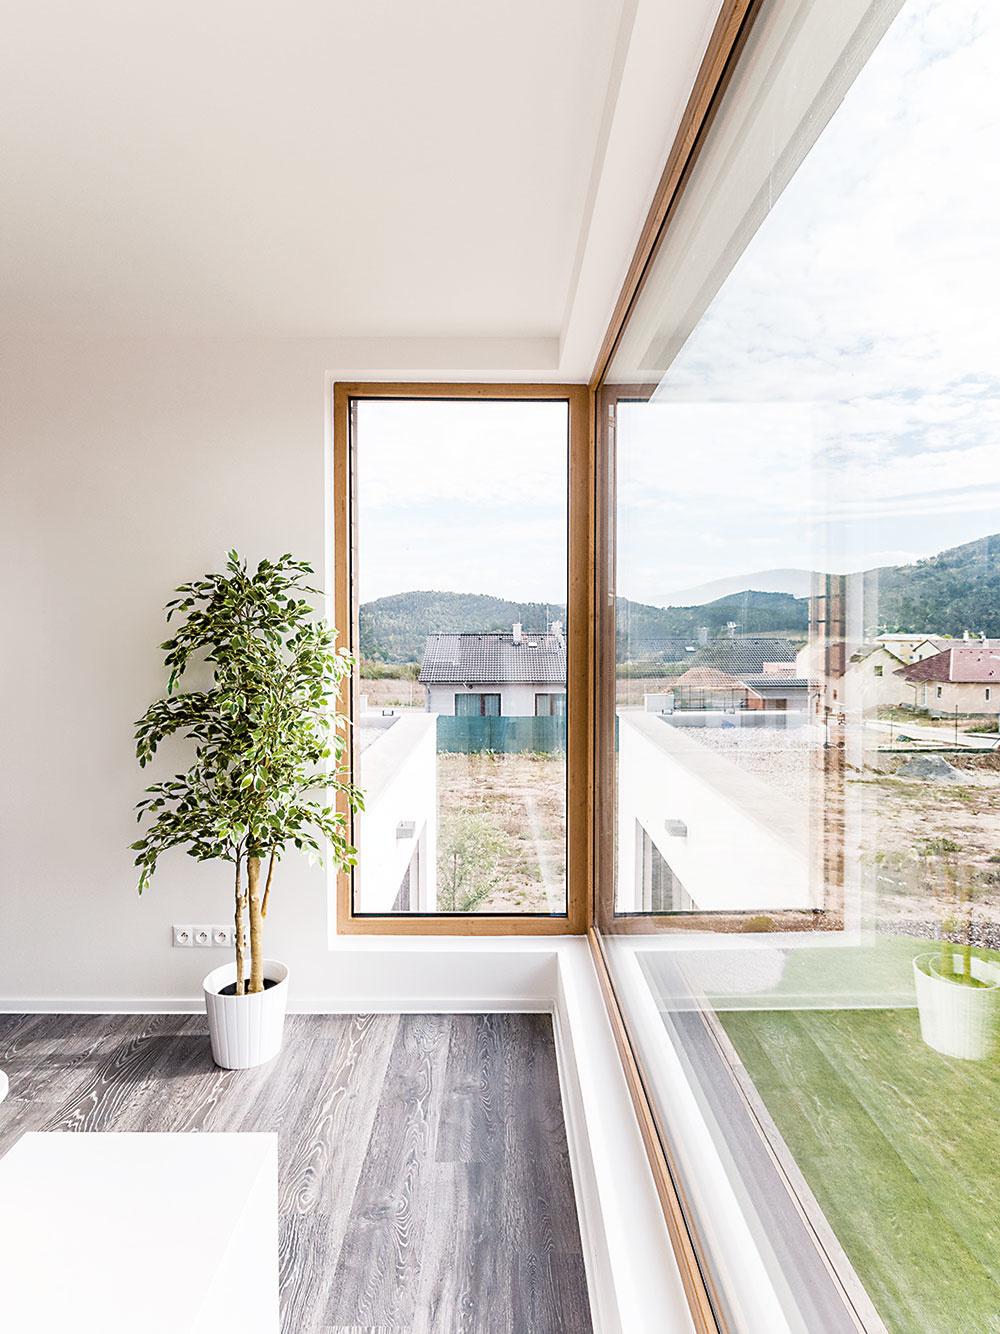 Vdrevostavbe vLevíne použili okná strojitým zasklením akvalitnými plastovými profilmi – Inoutic Eforte (drevený dekor na poschodí obloženom drevom) aInoutic Prestige (antracitová sivá na omietnutom prízemí).